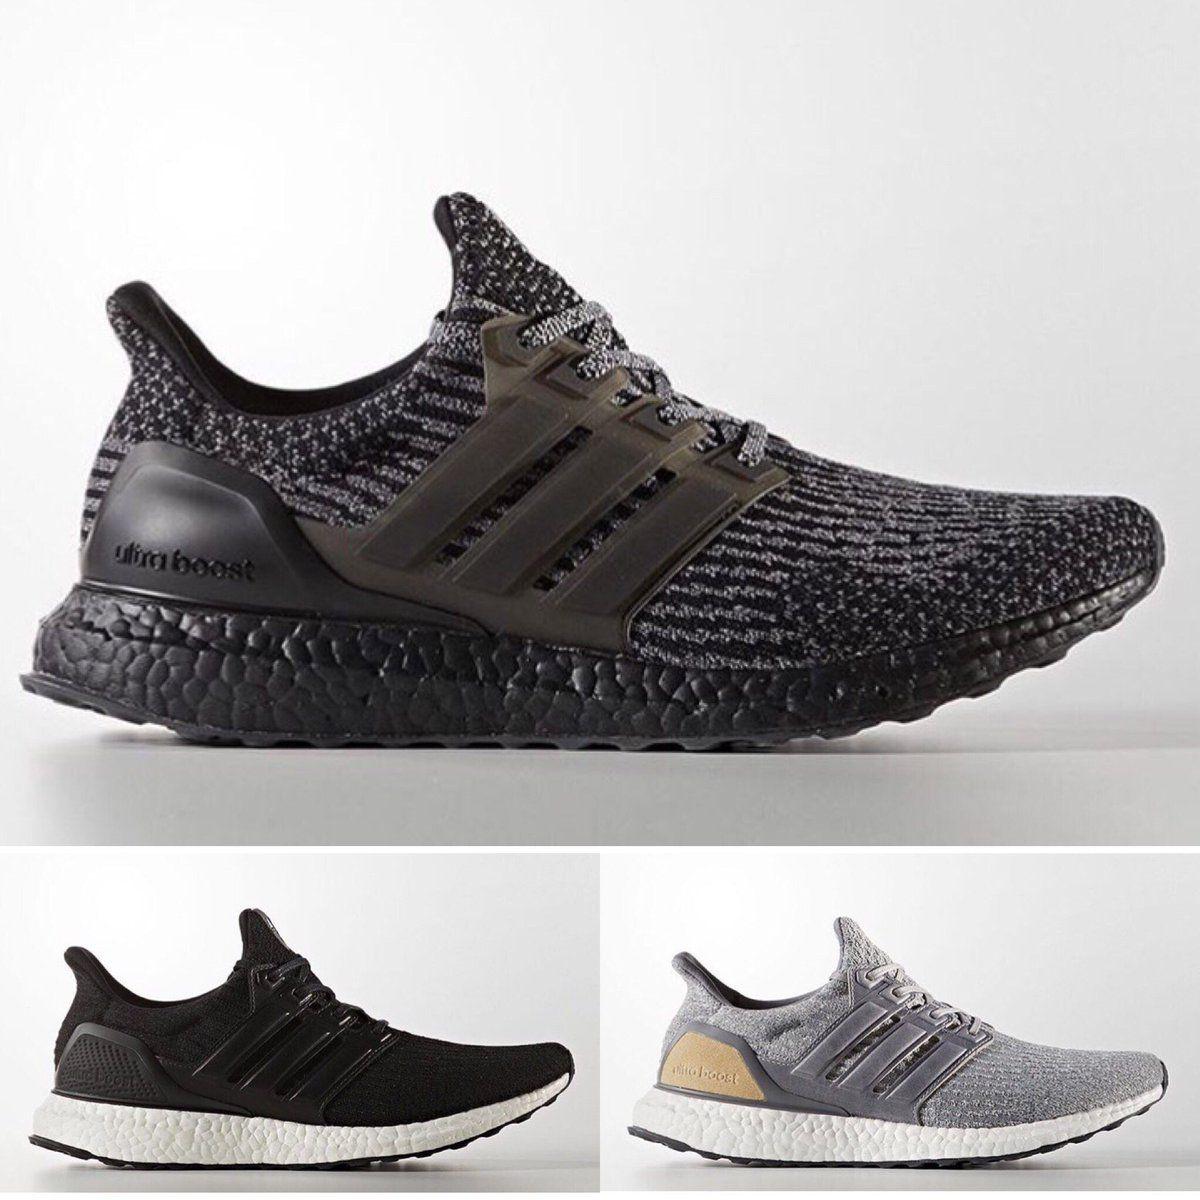 super popular 91005 9e157 (1) ⚡Lucky⚡ ( binbinbon2014)   Twitter Nike Tanjun, Adidas